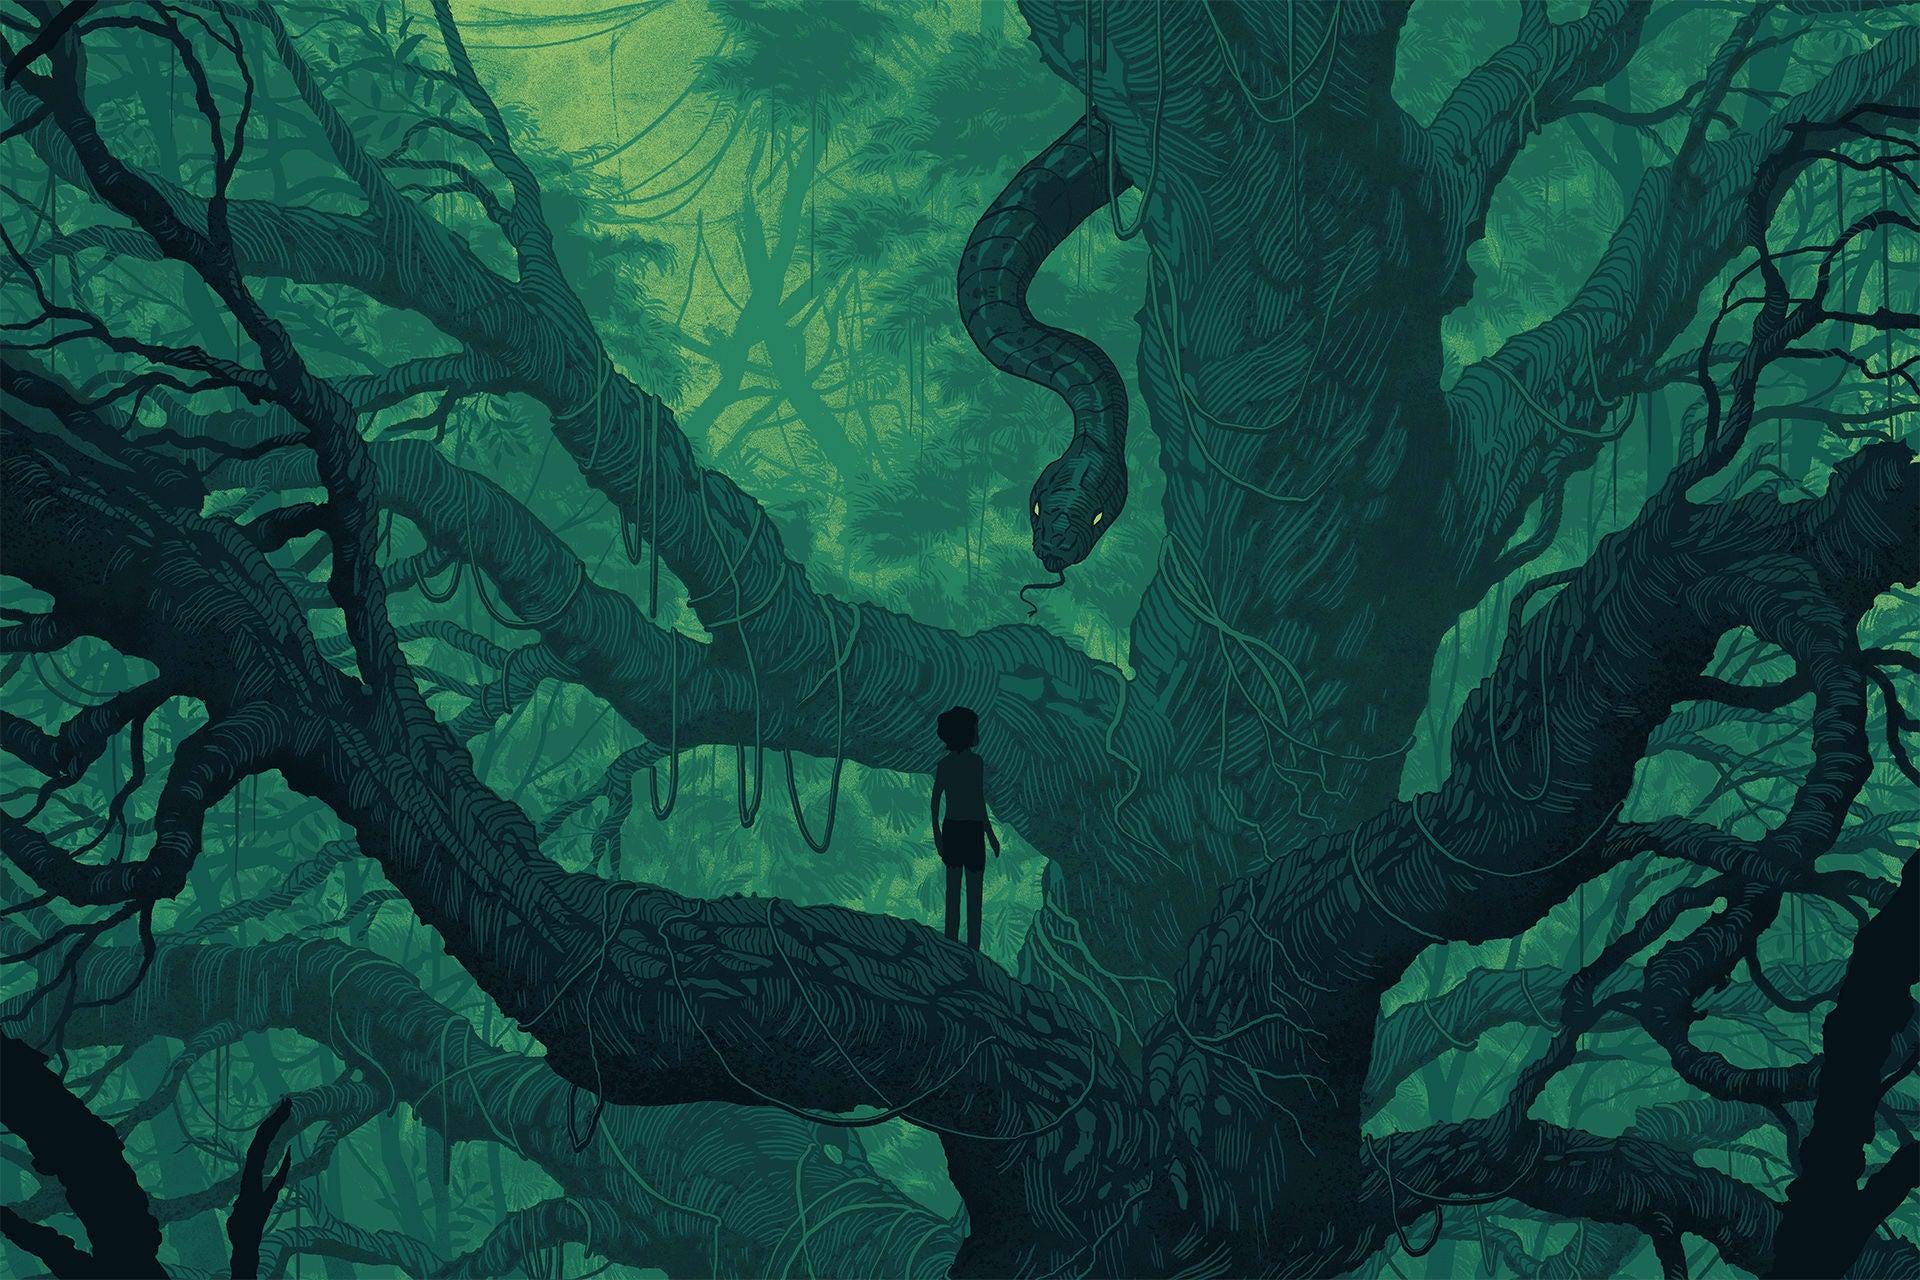 art cyclops-print-works daniel-danger io9 jon-favreau jungle-book mondo posters the-jungle-book